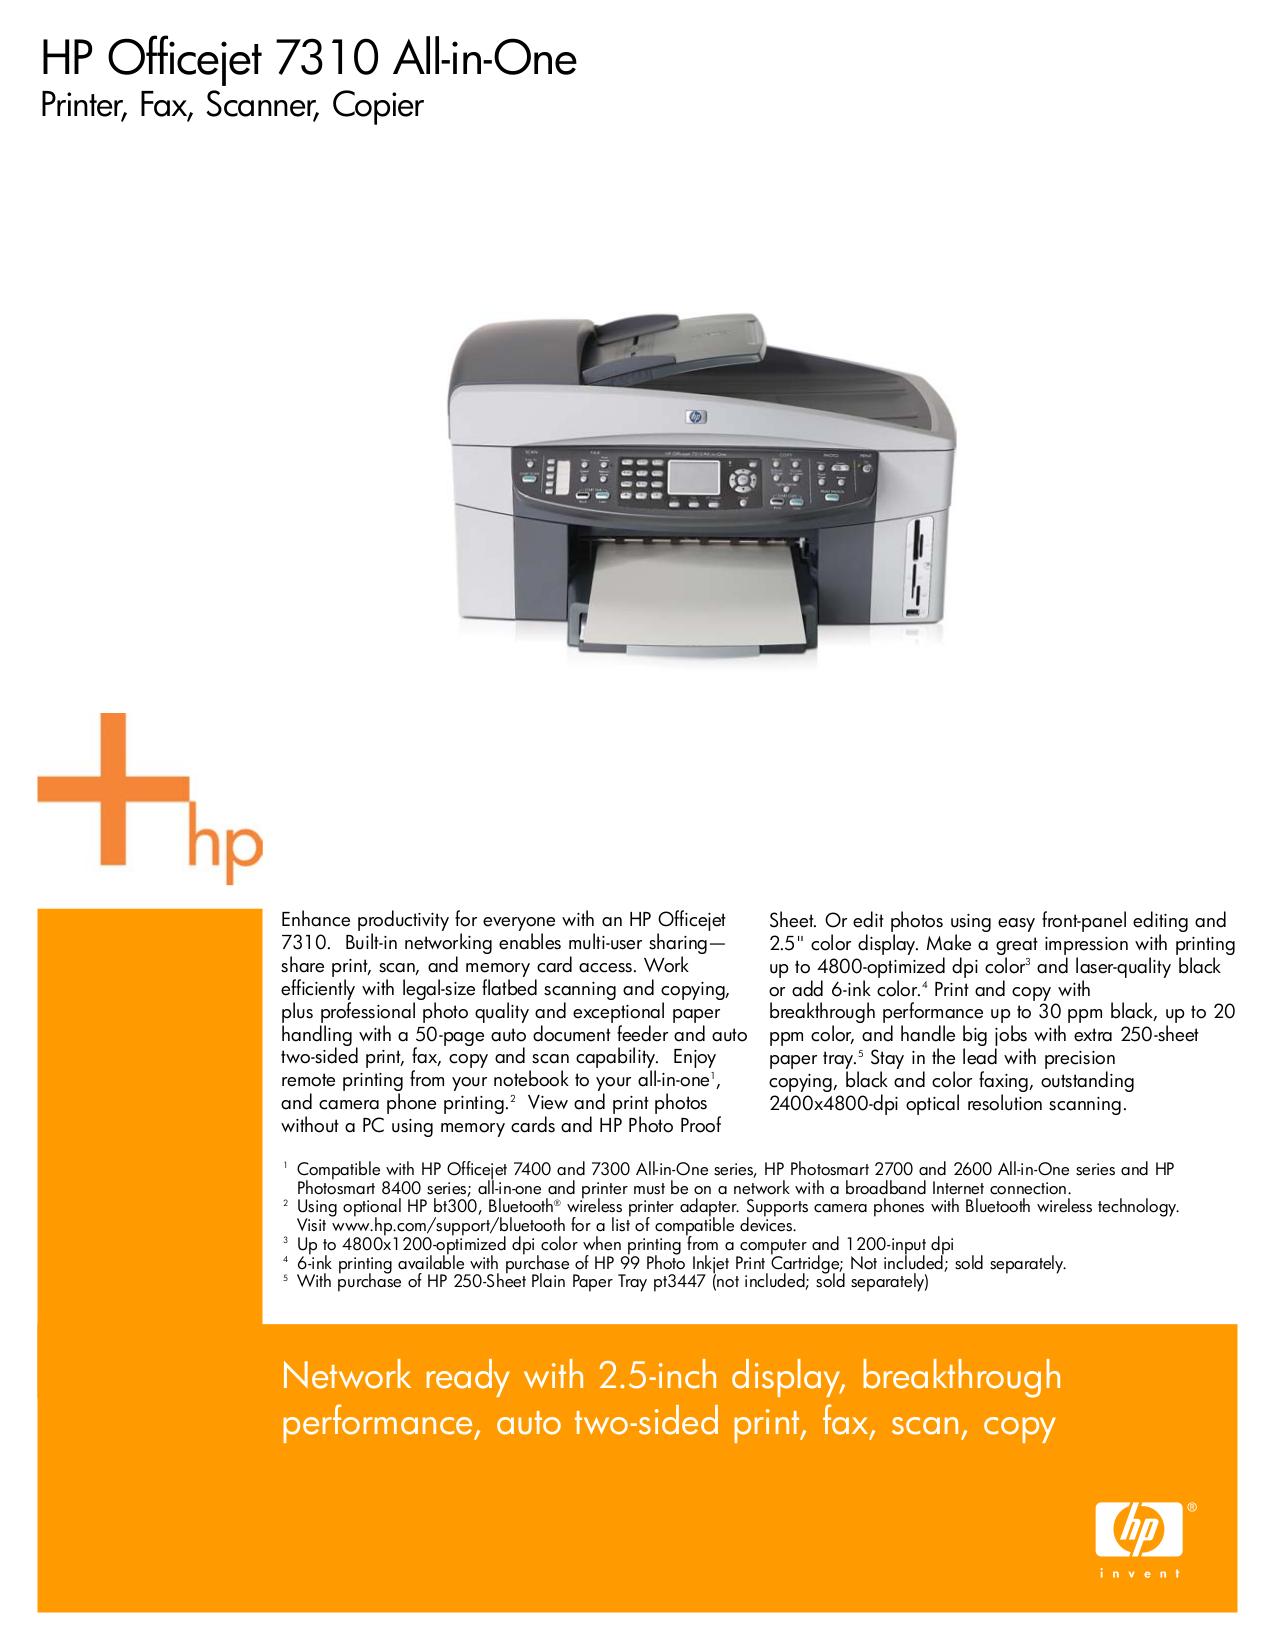 pdf for HP Printer Photosmart 7400 manual